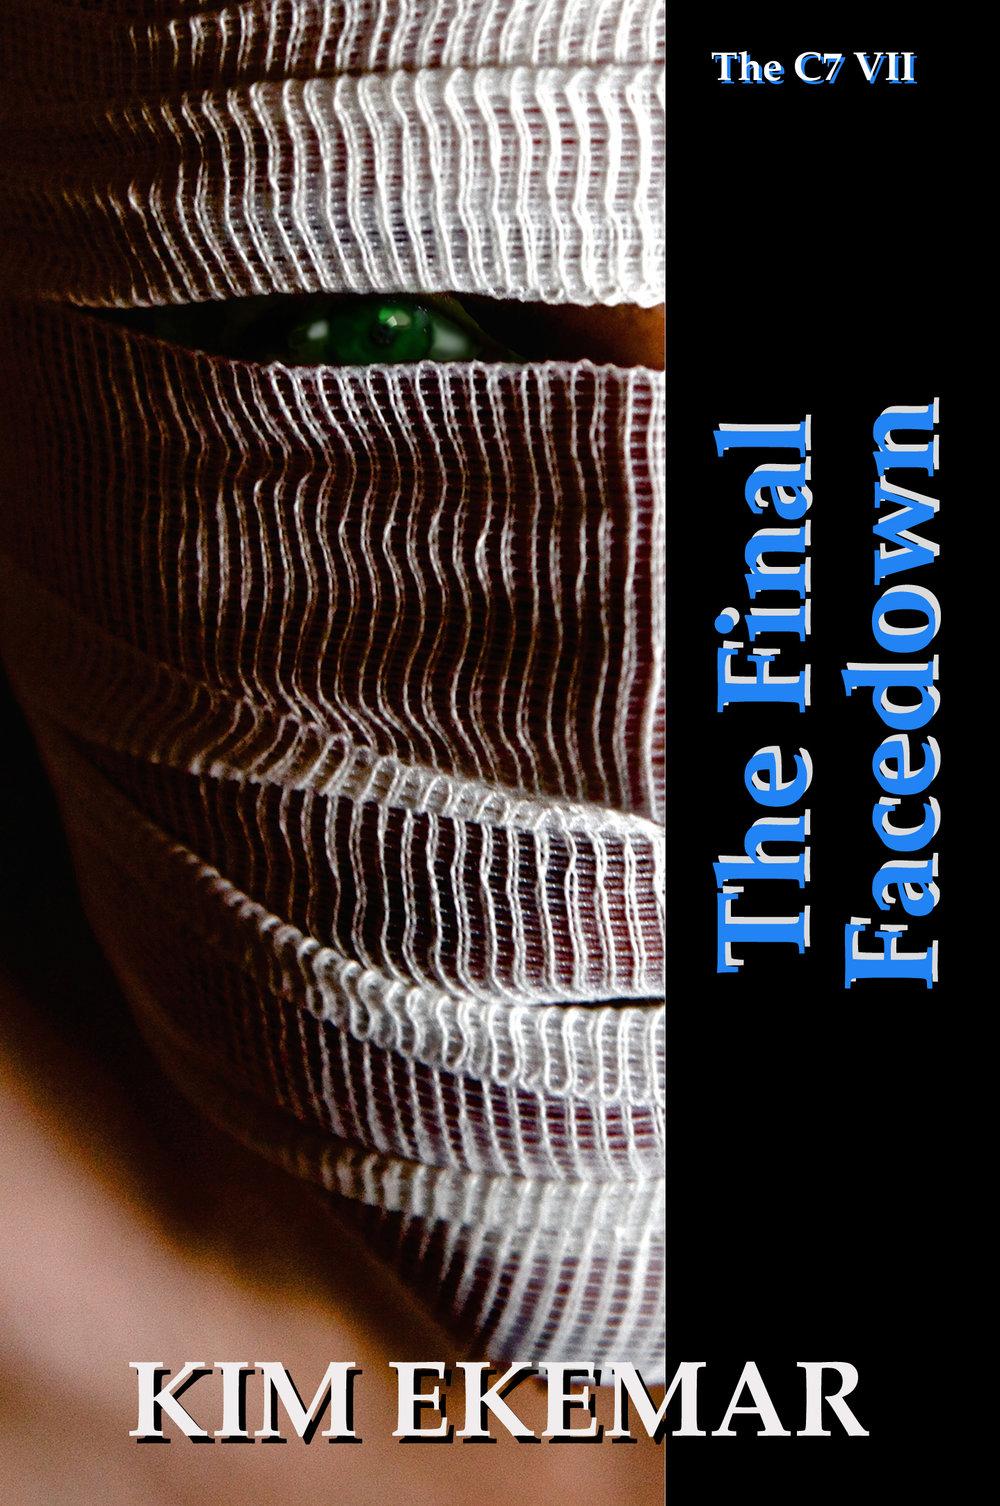 180429 KINDLE The Final Facedown.jpg